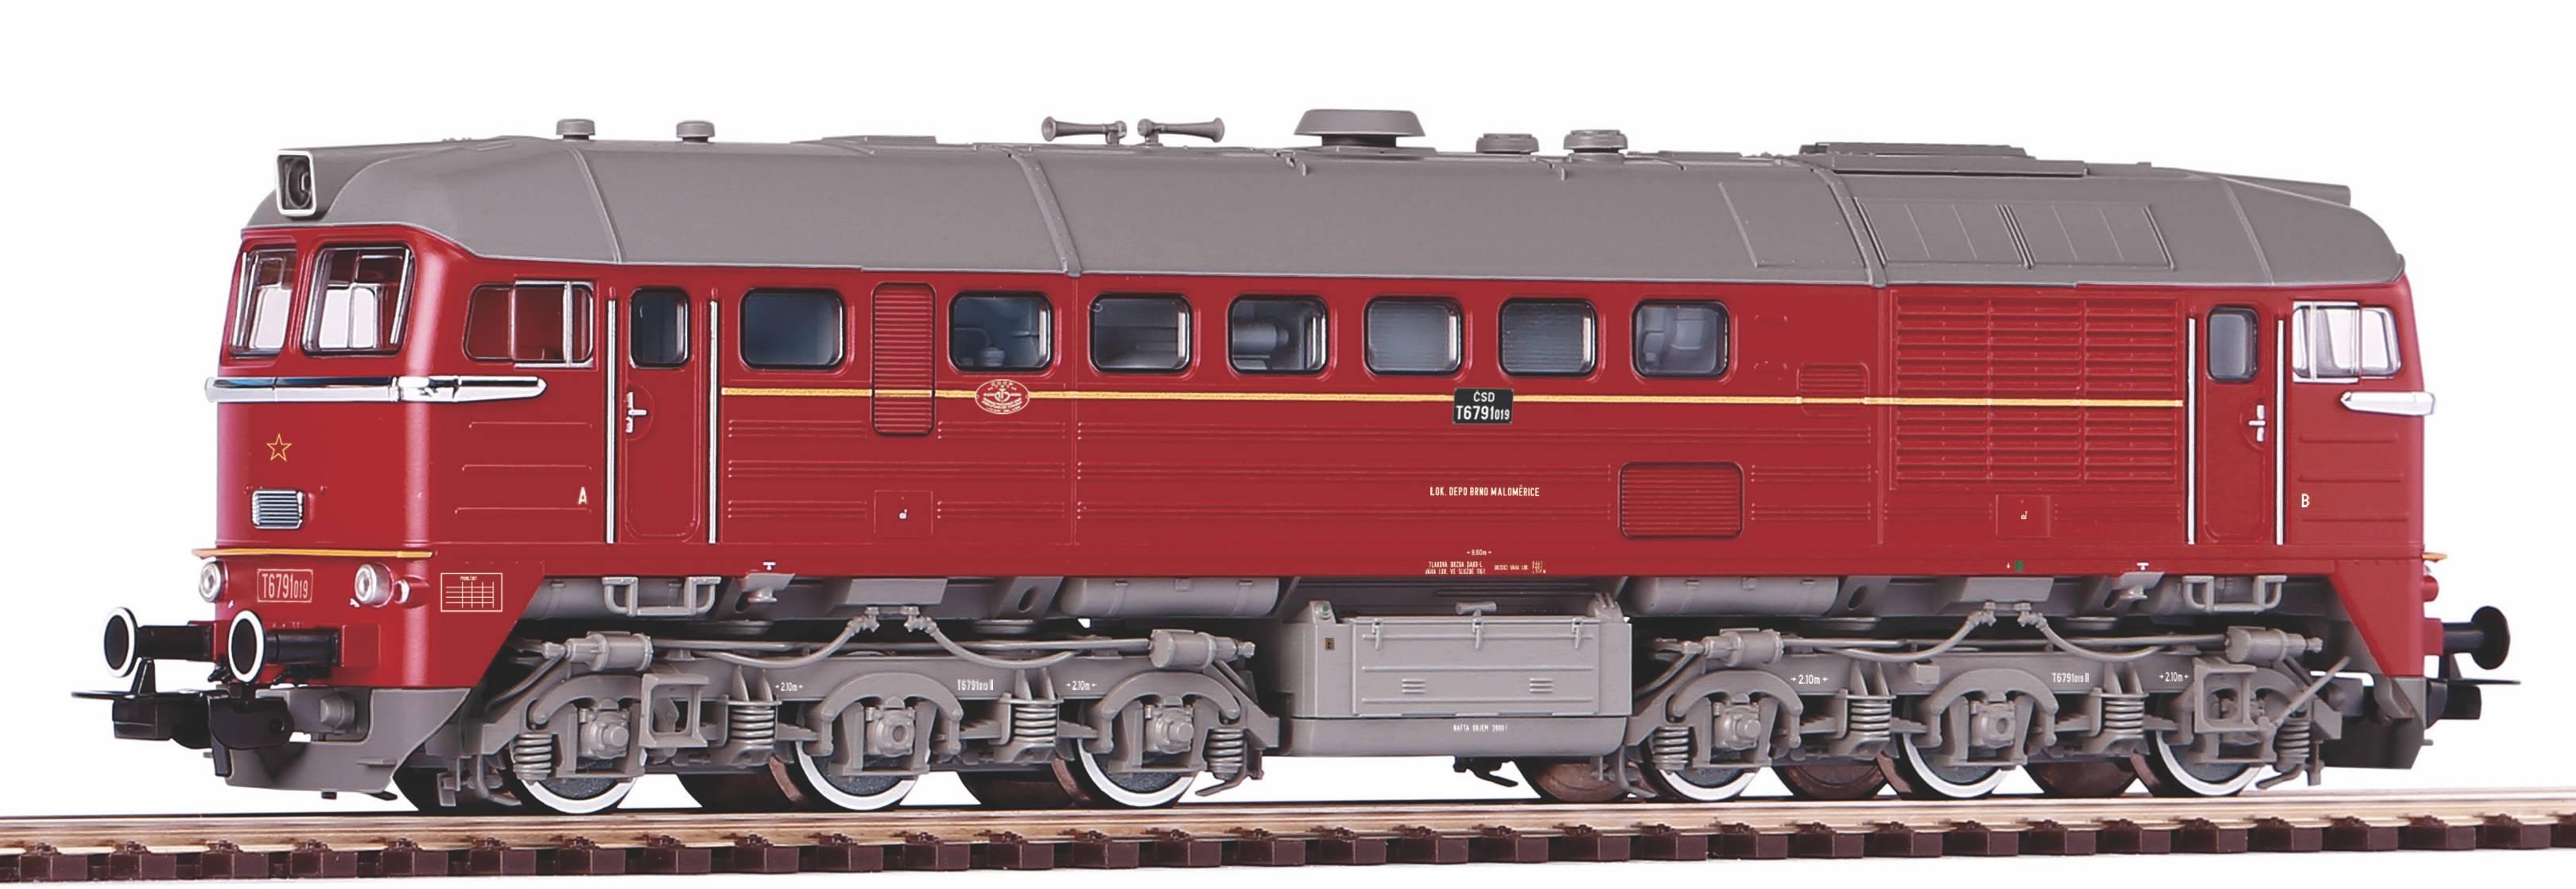 Piko Dieselová lokomotiva T679 ČSD IV - 52819